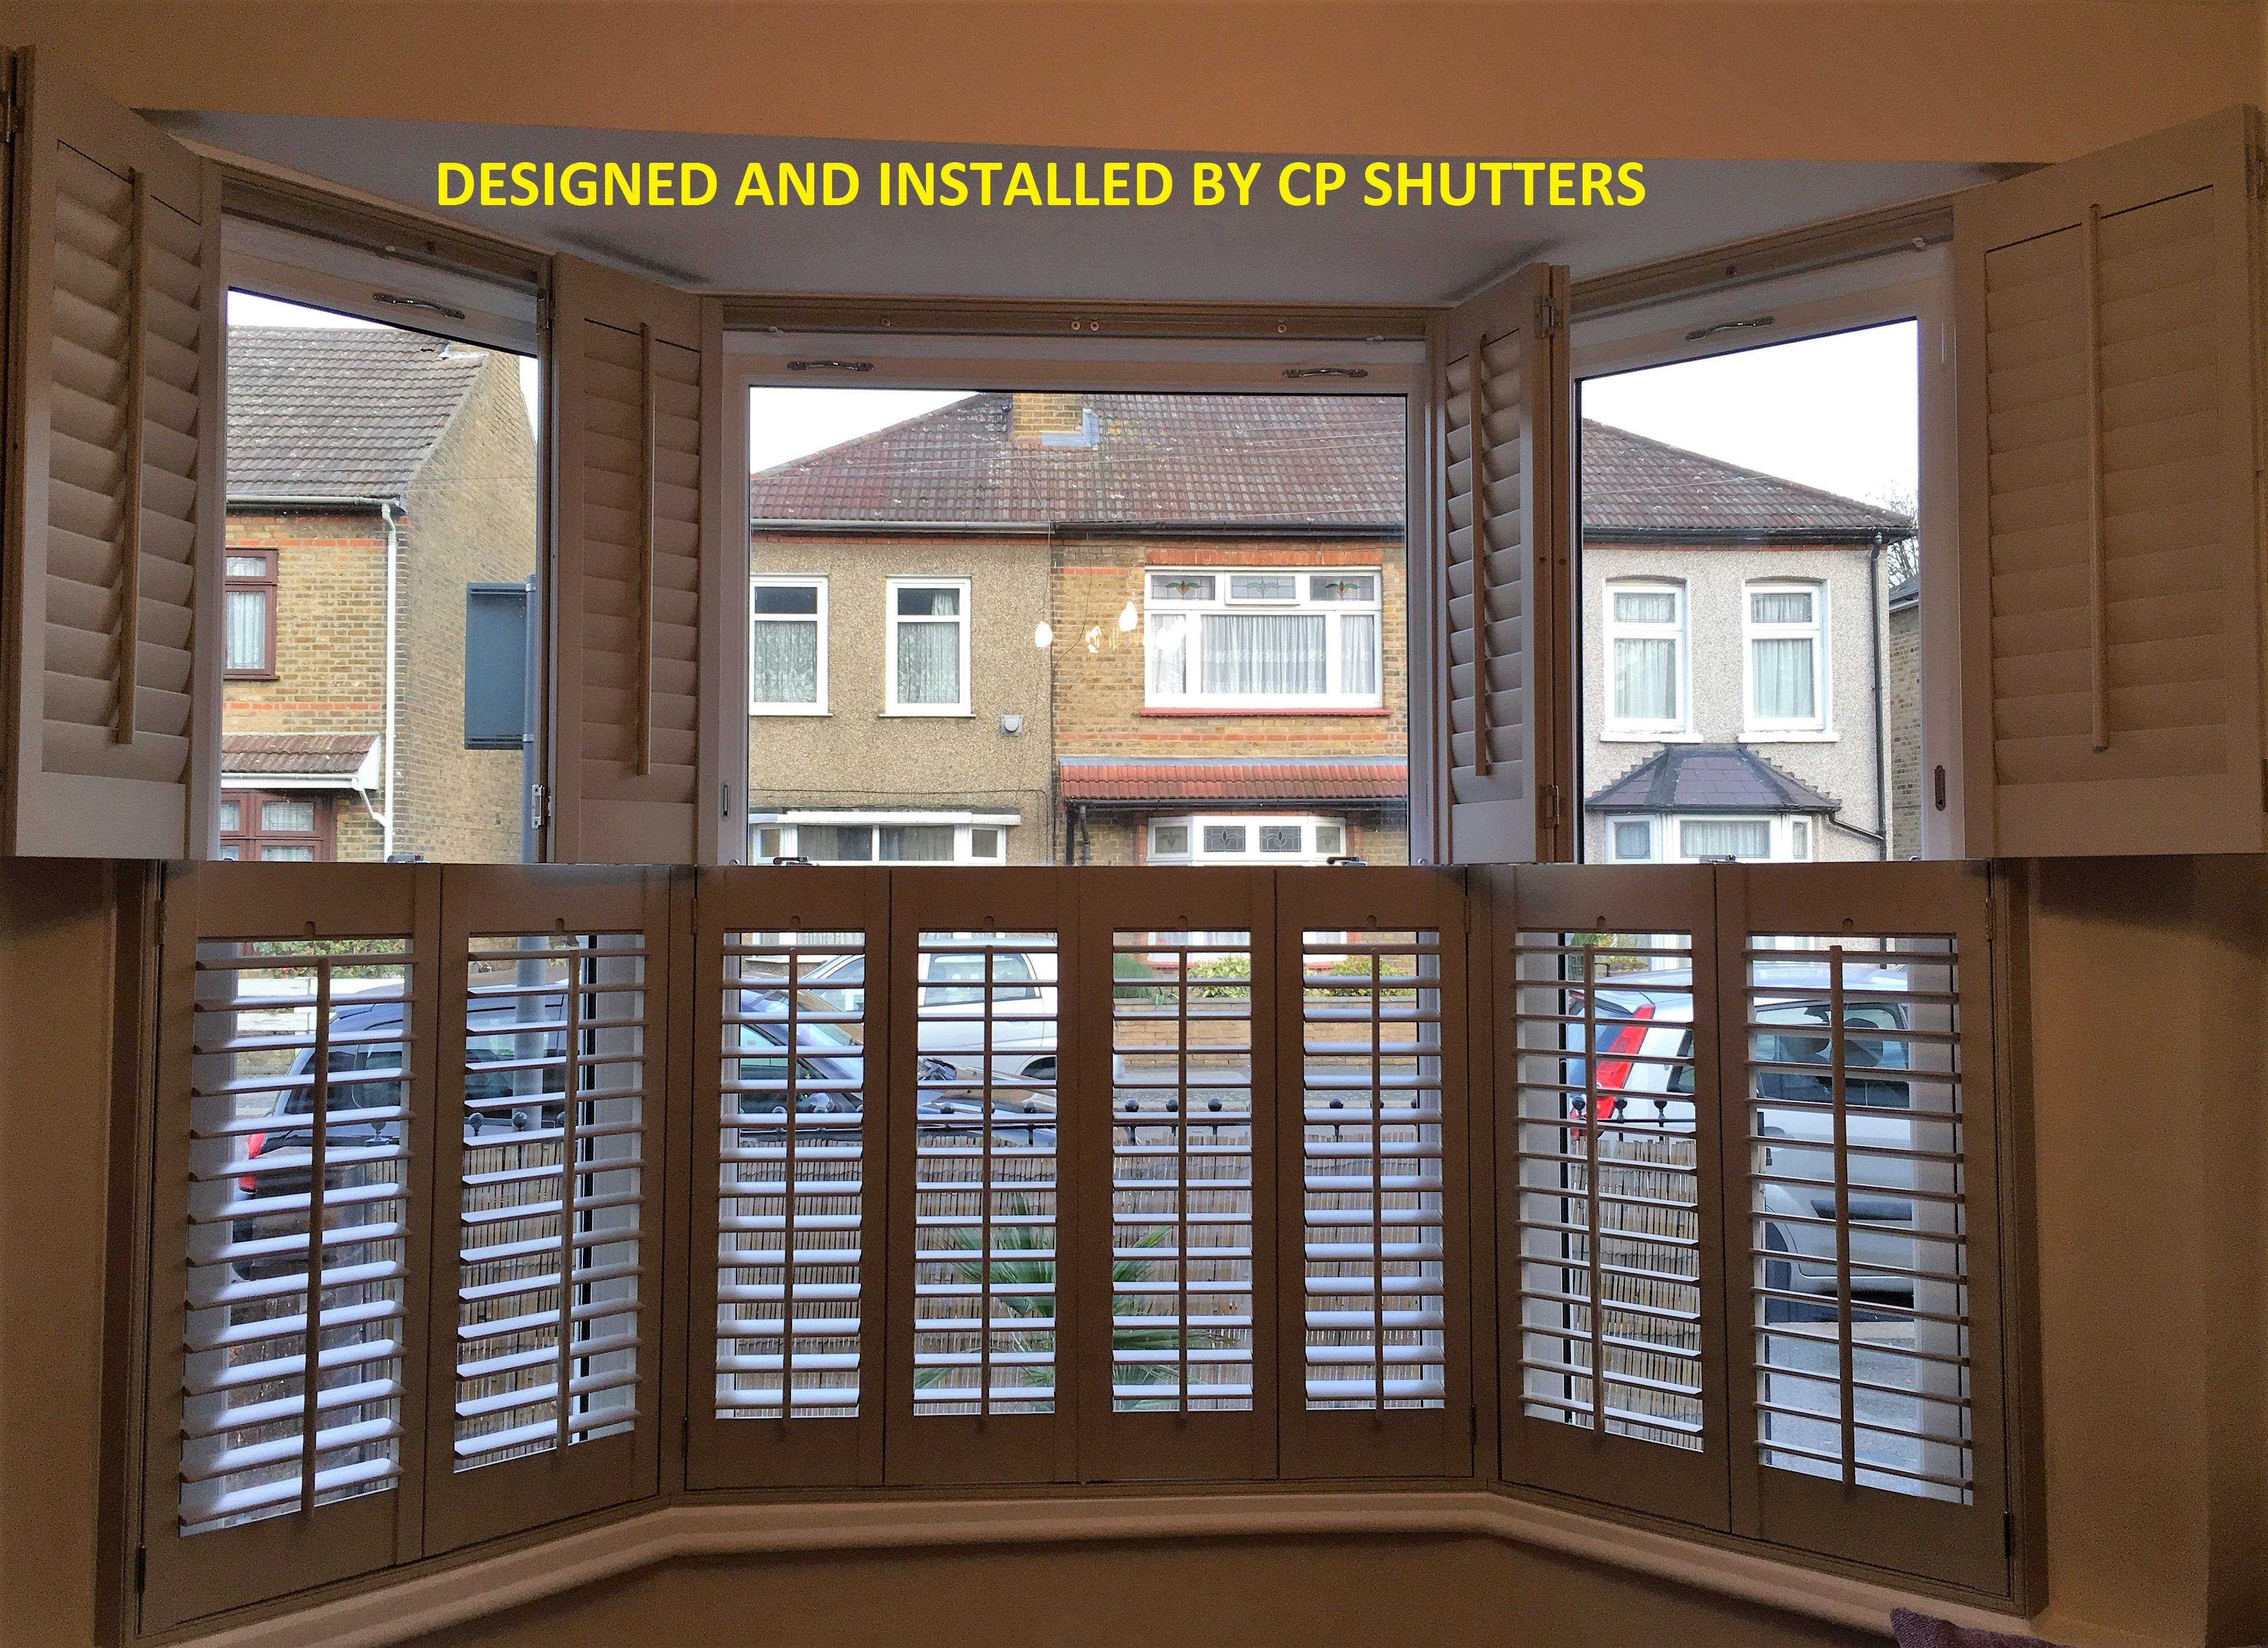 Wood shutters essex plantation shutters essex interior - Unfinished wood shutters interior ...